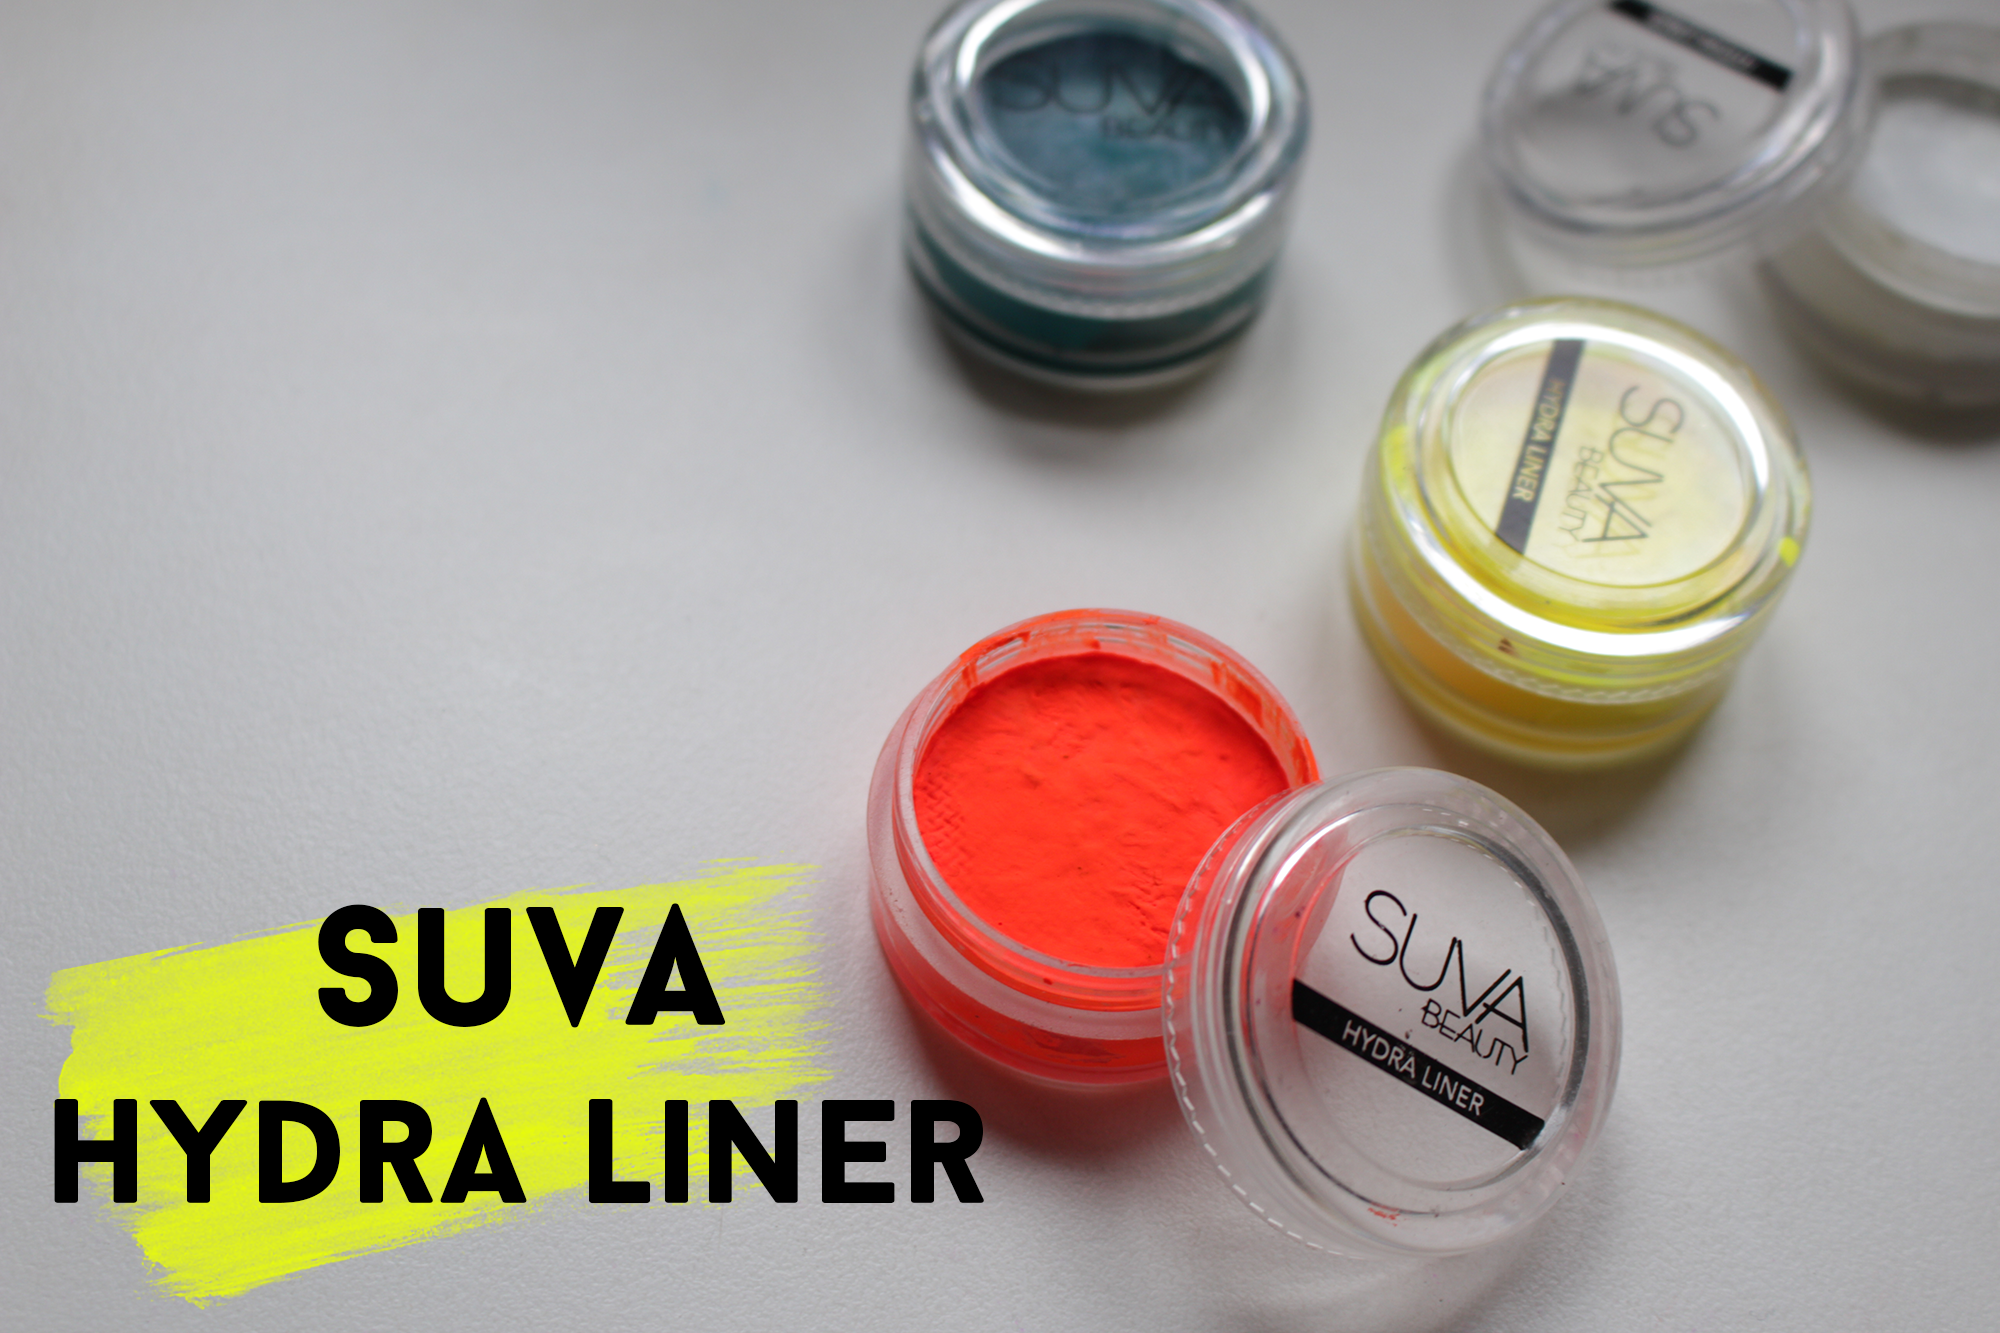 SUVA Hydra Liner